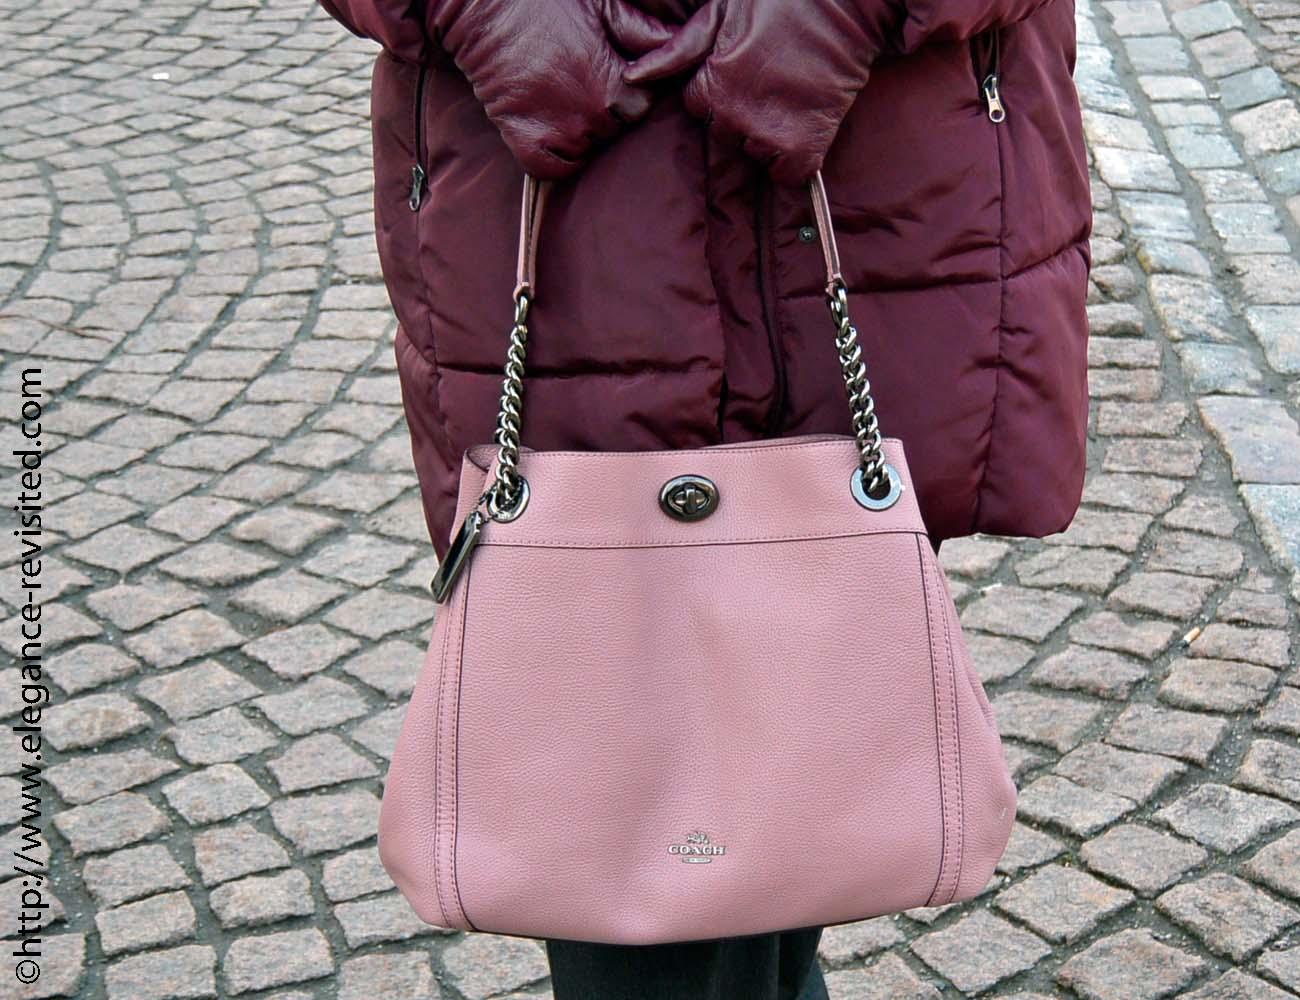 blush and burgundy